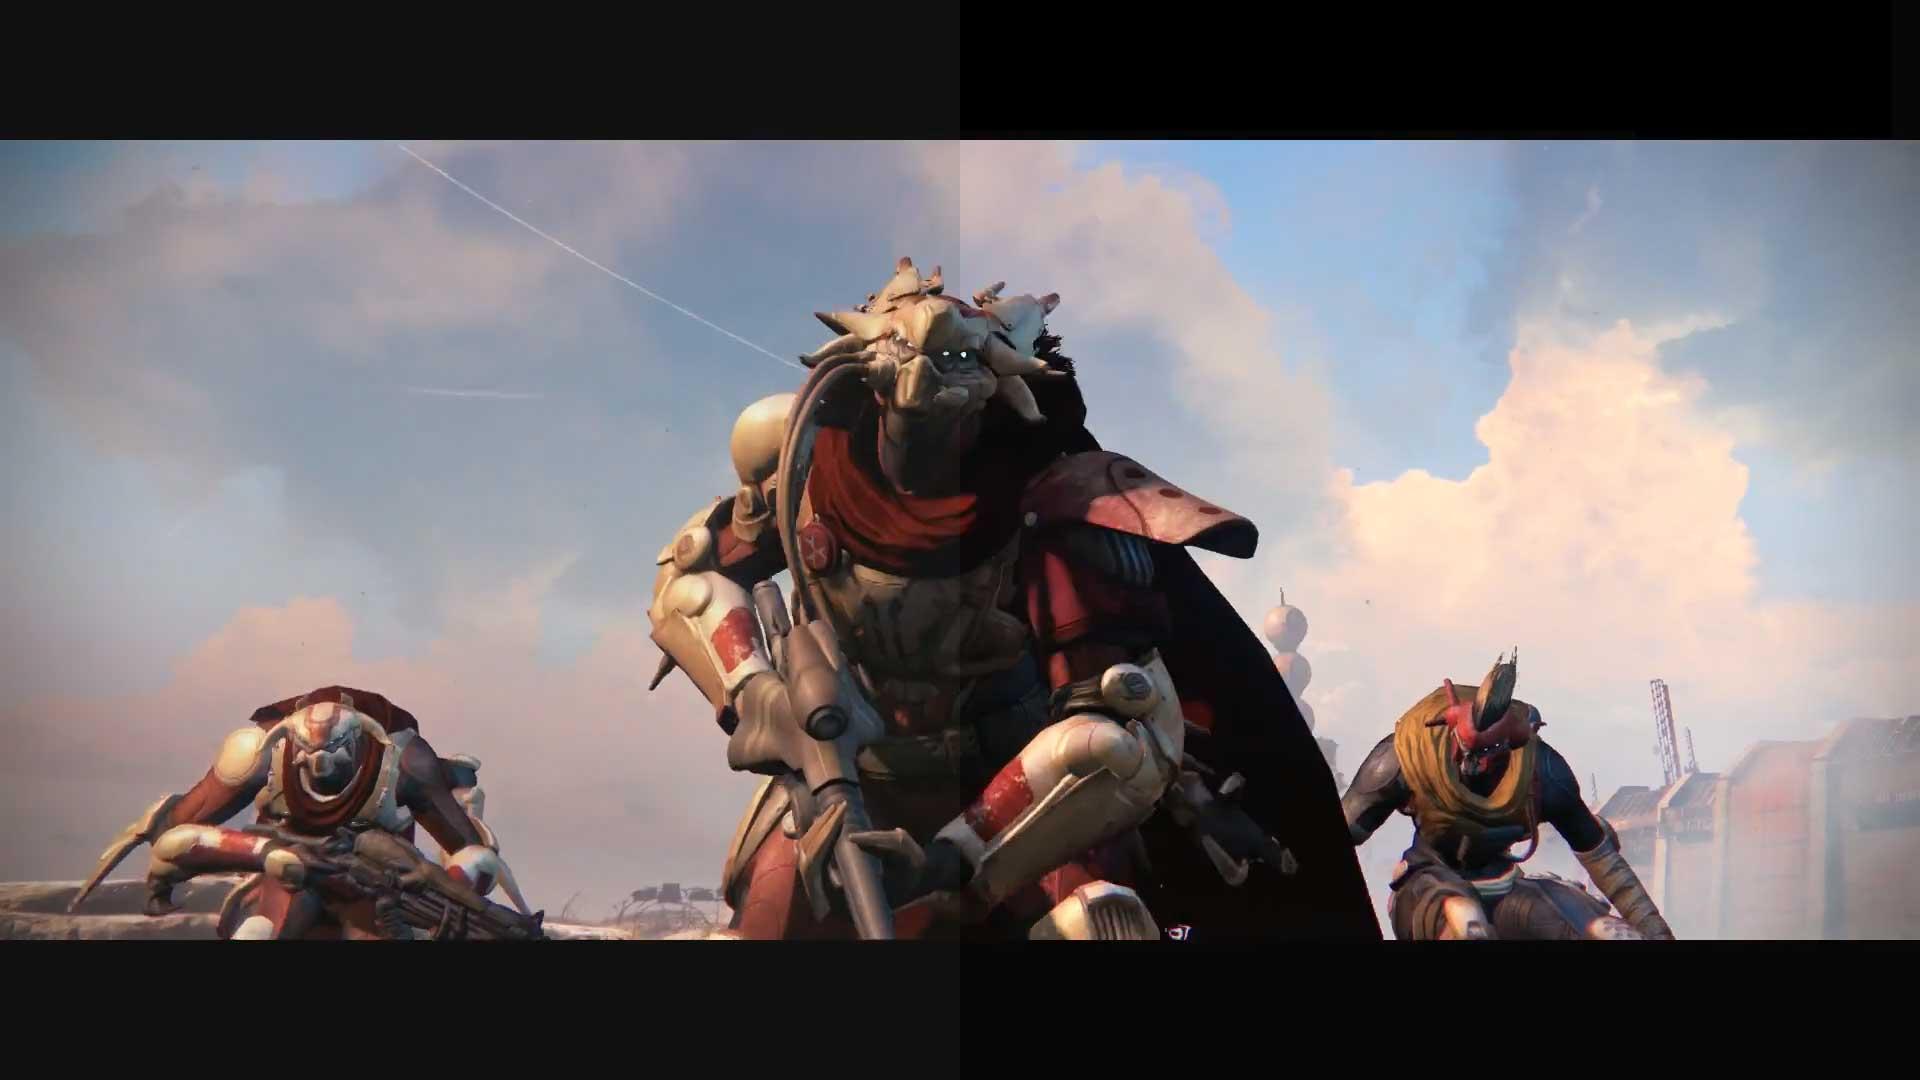 Destiny-ps4-vs-xbox-one-(2)